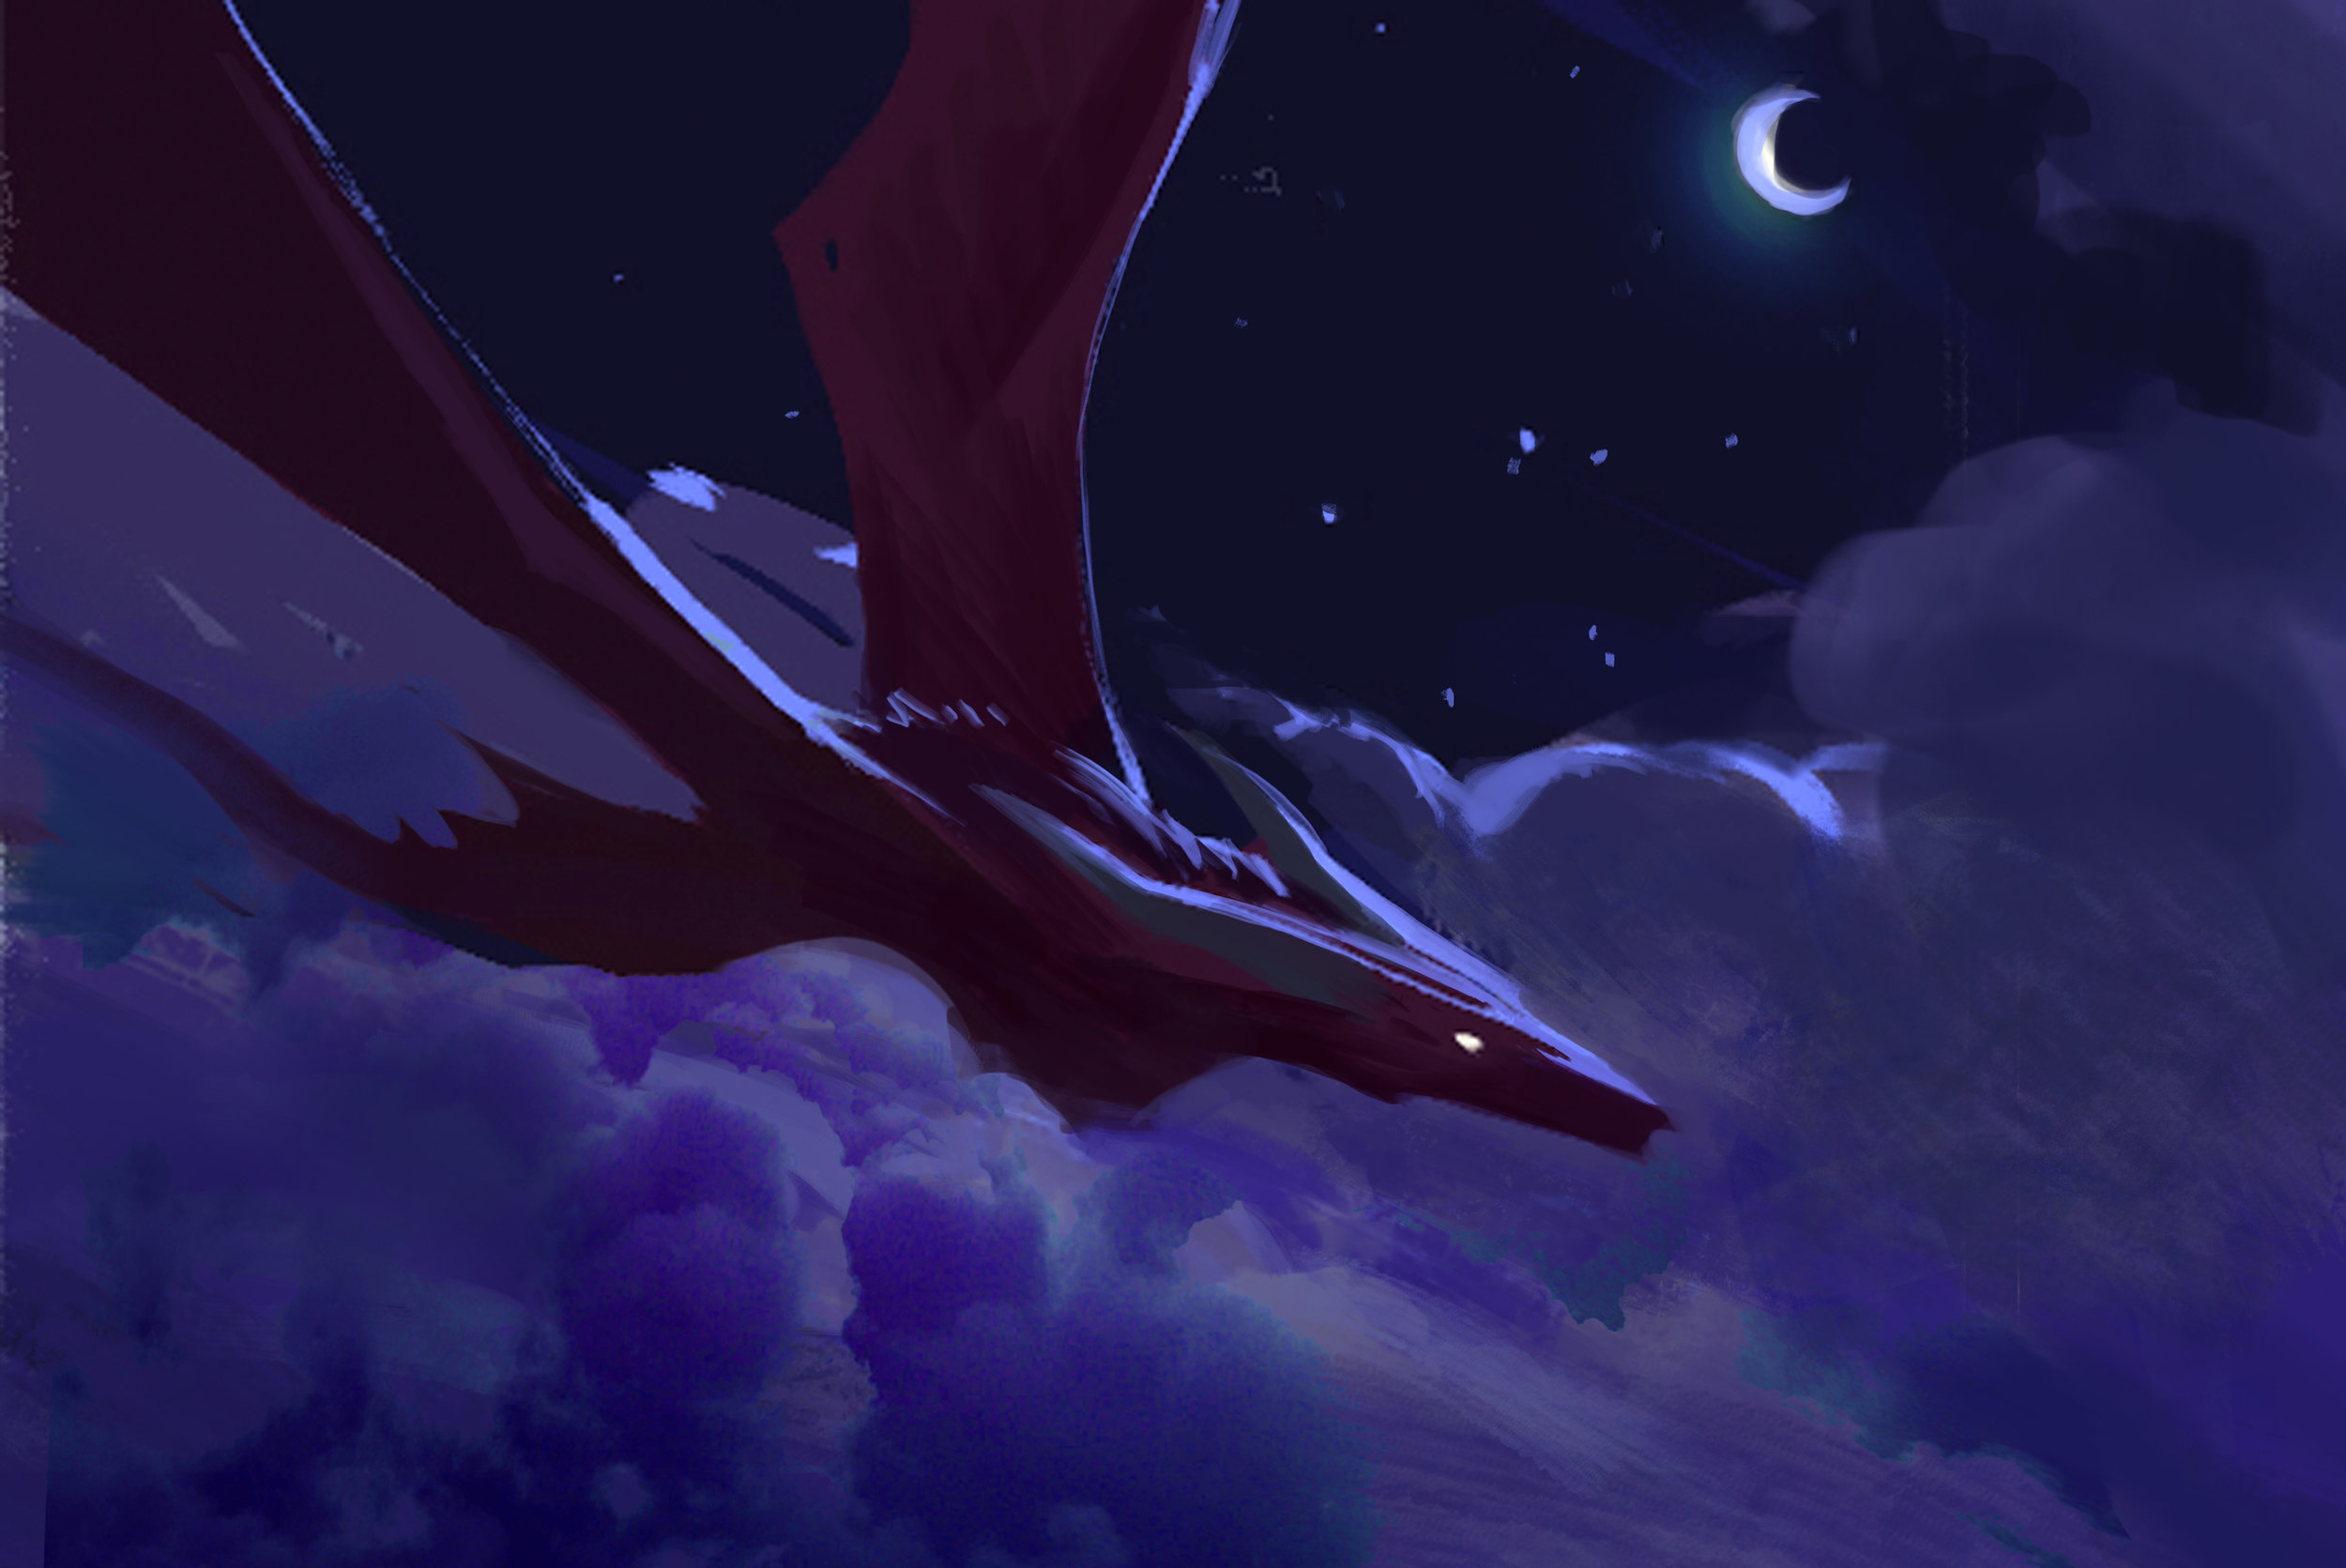 08-19-2015_ArroNight_doodle.jpg